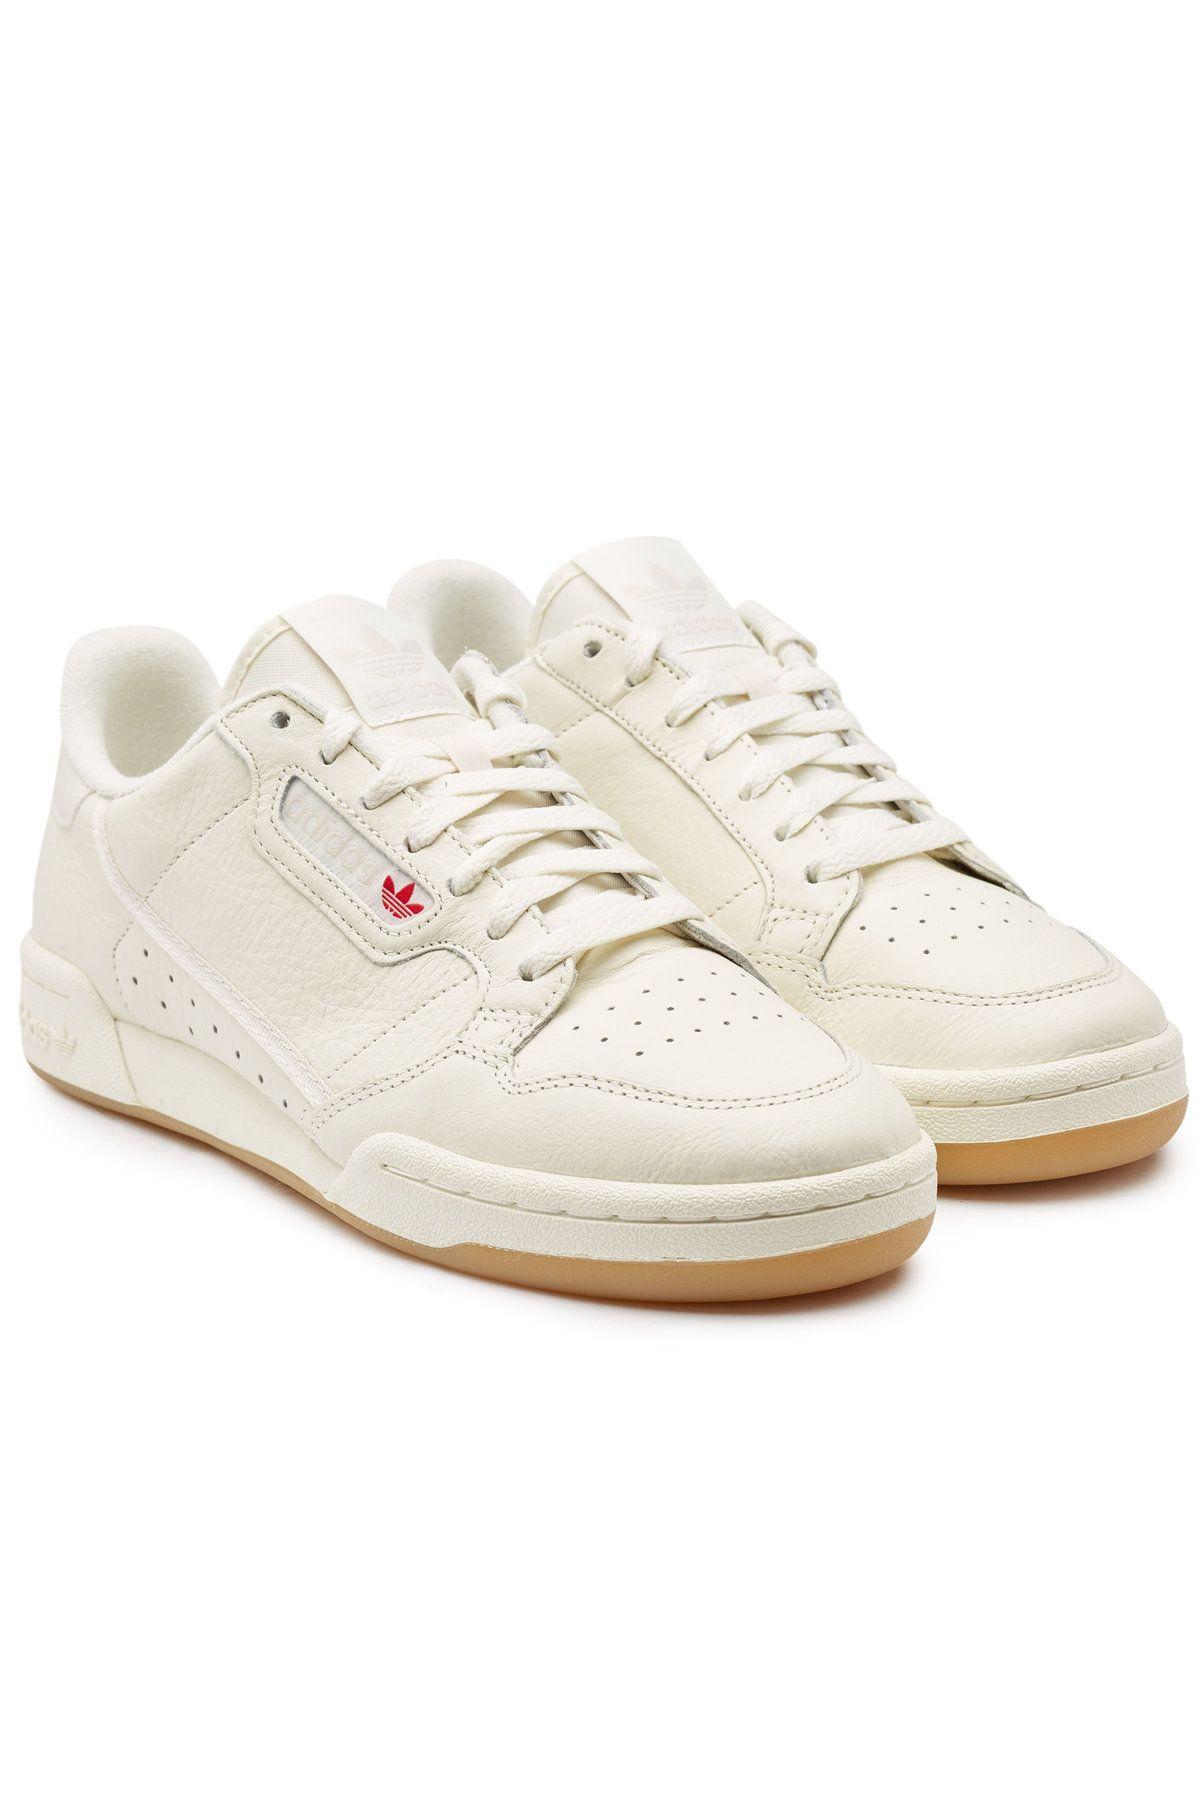 c8ad2231a2 ADIDAS ORIGINALS CONTINENTAL 80 LEATHER SNEAKERS. #adidasoriginals #shoes